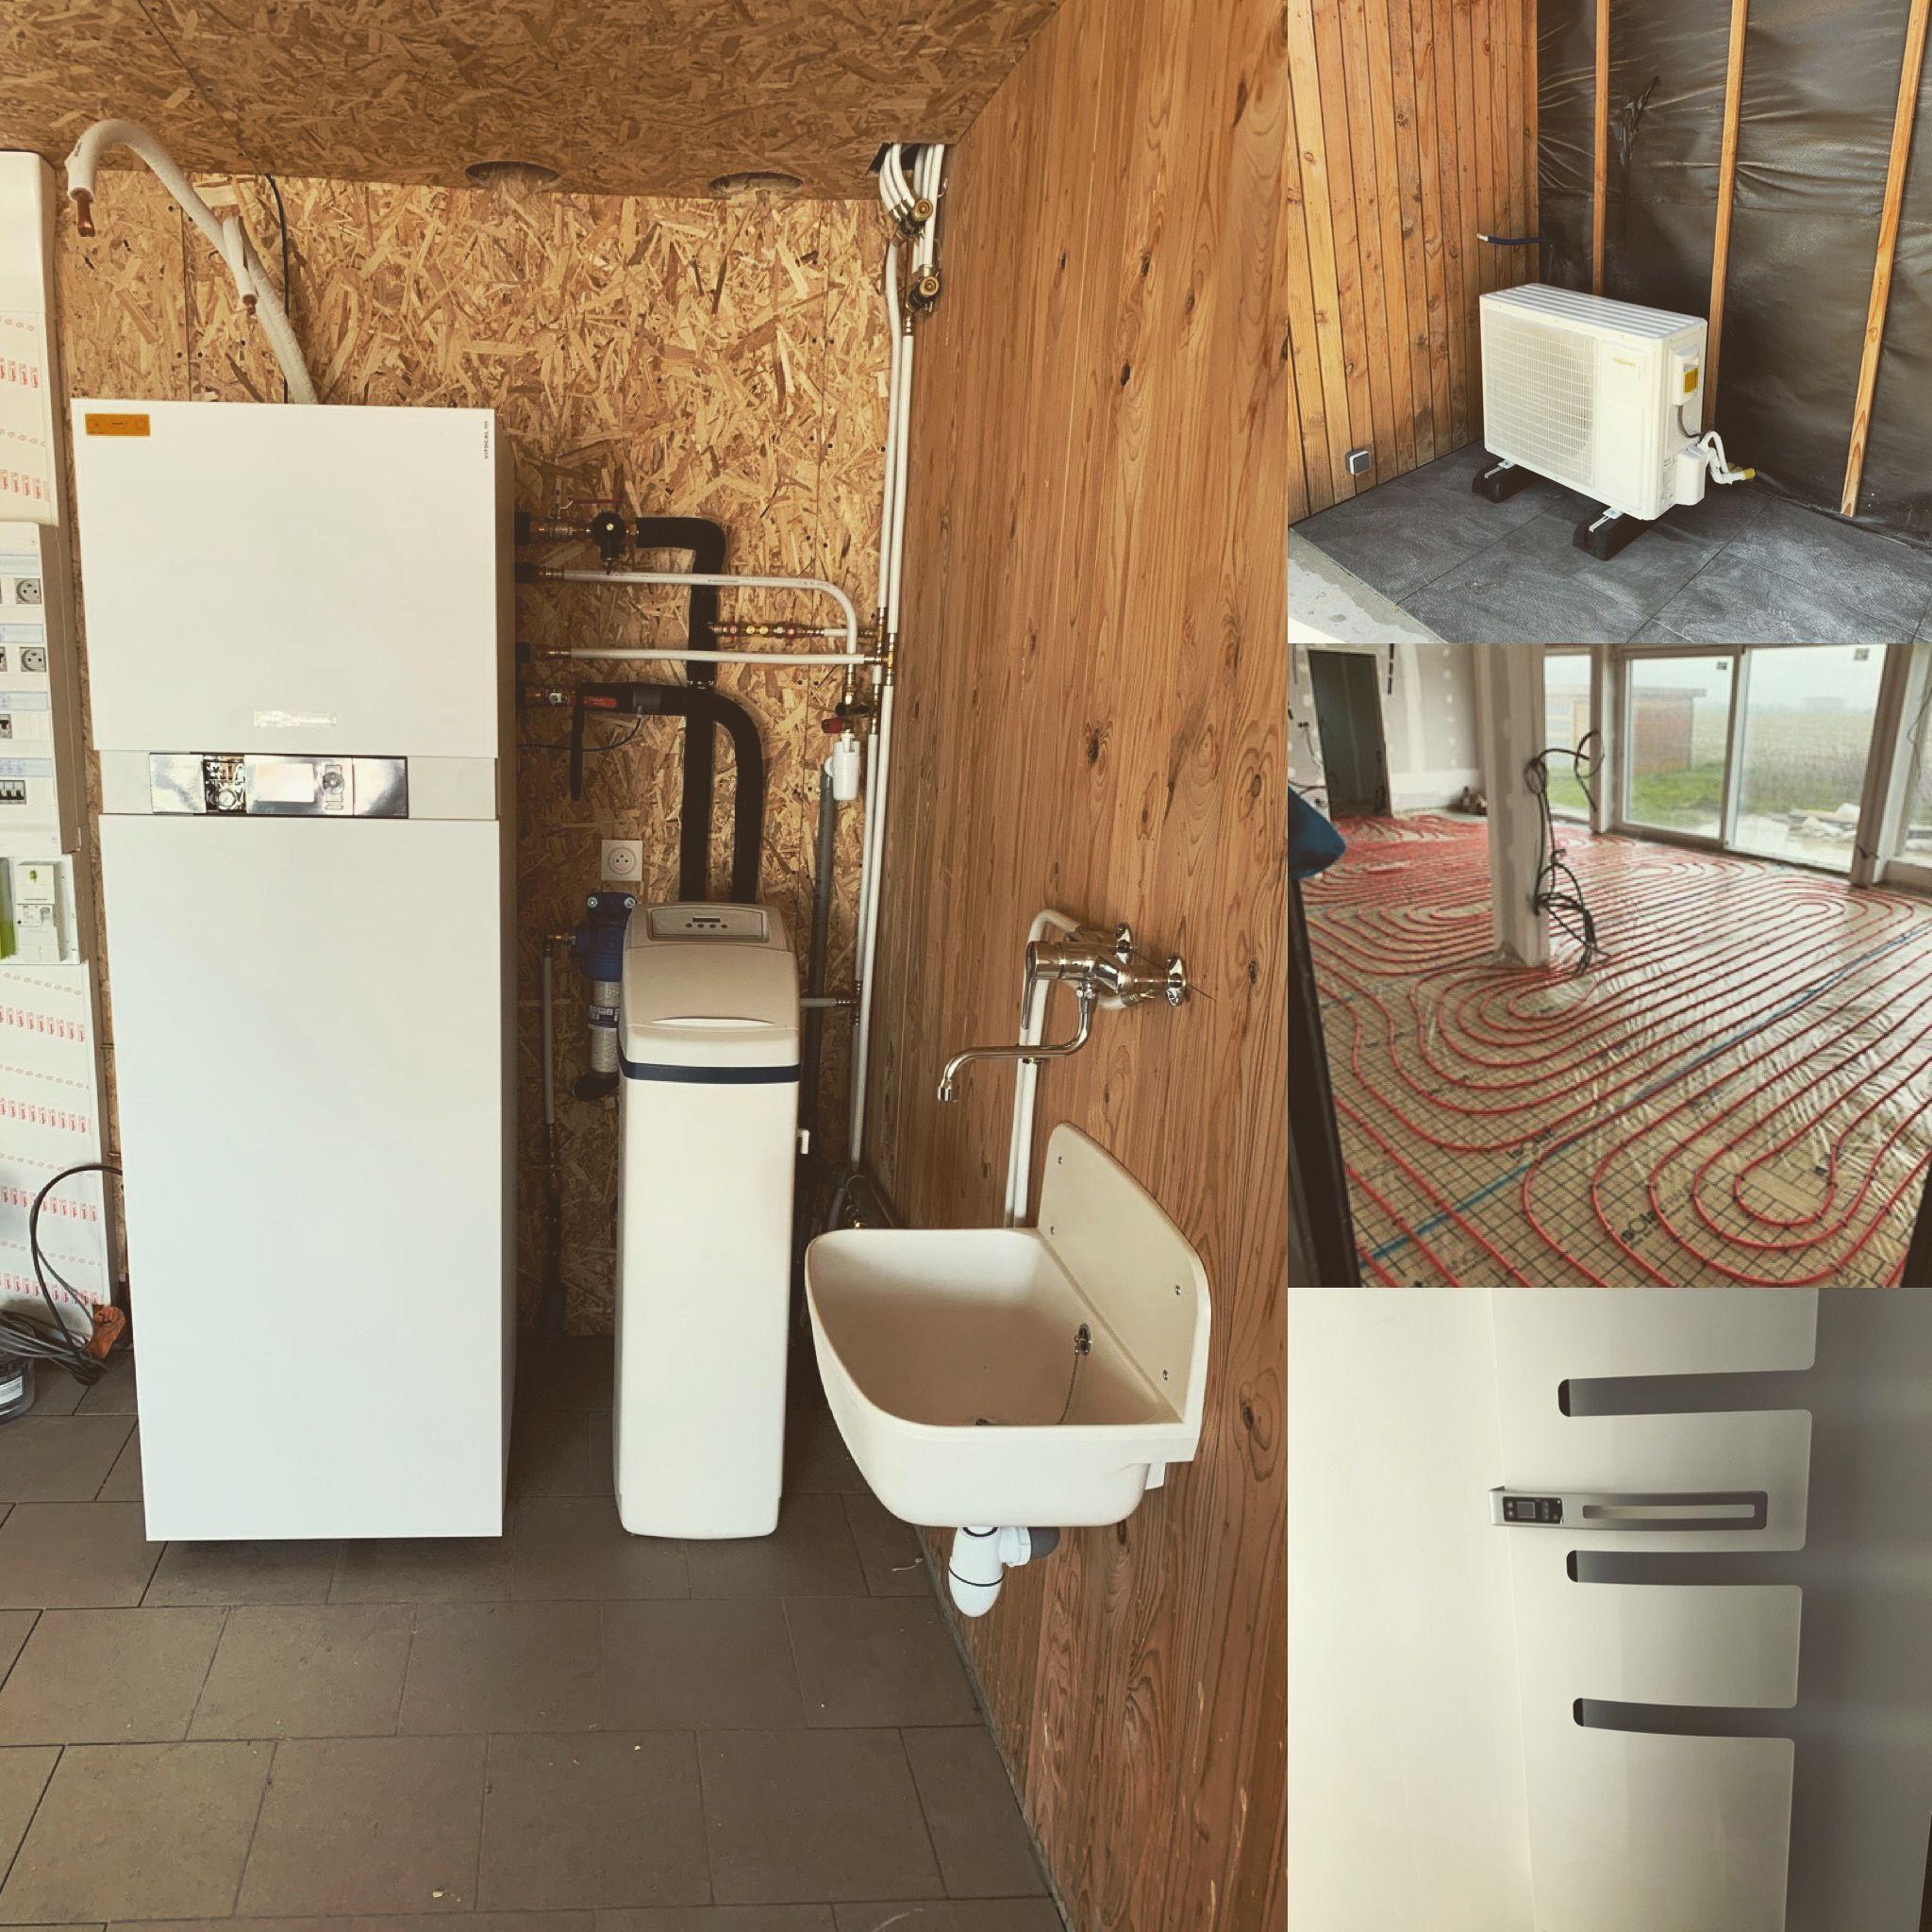 Epingle Sur Nouvelles Installations Daol Energies